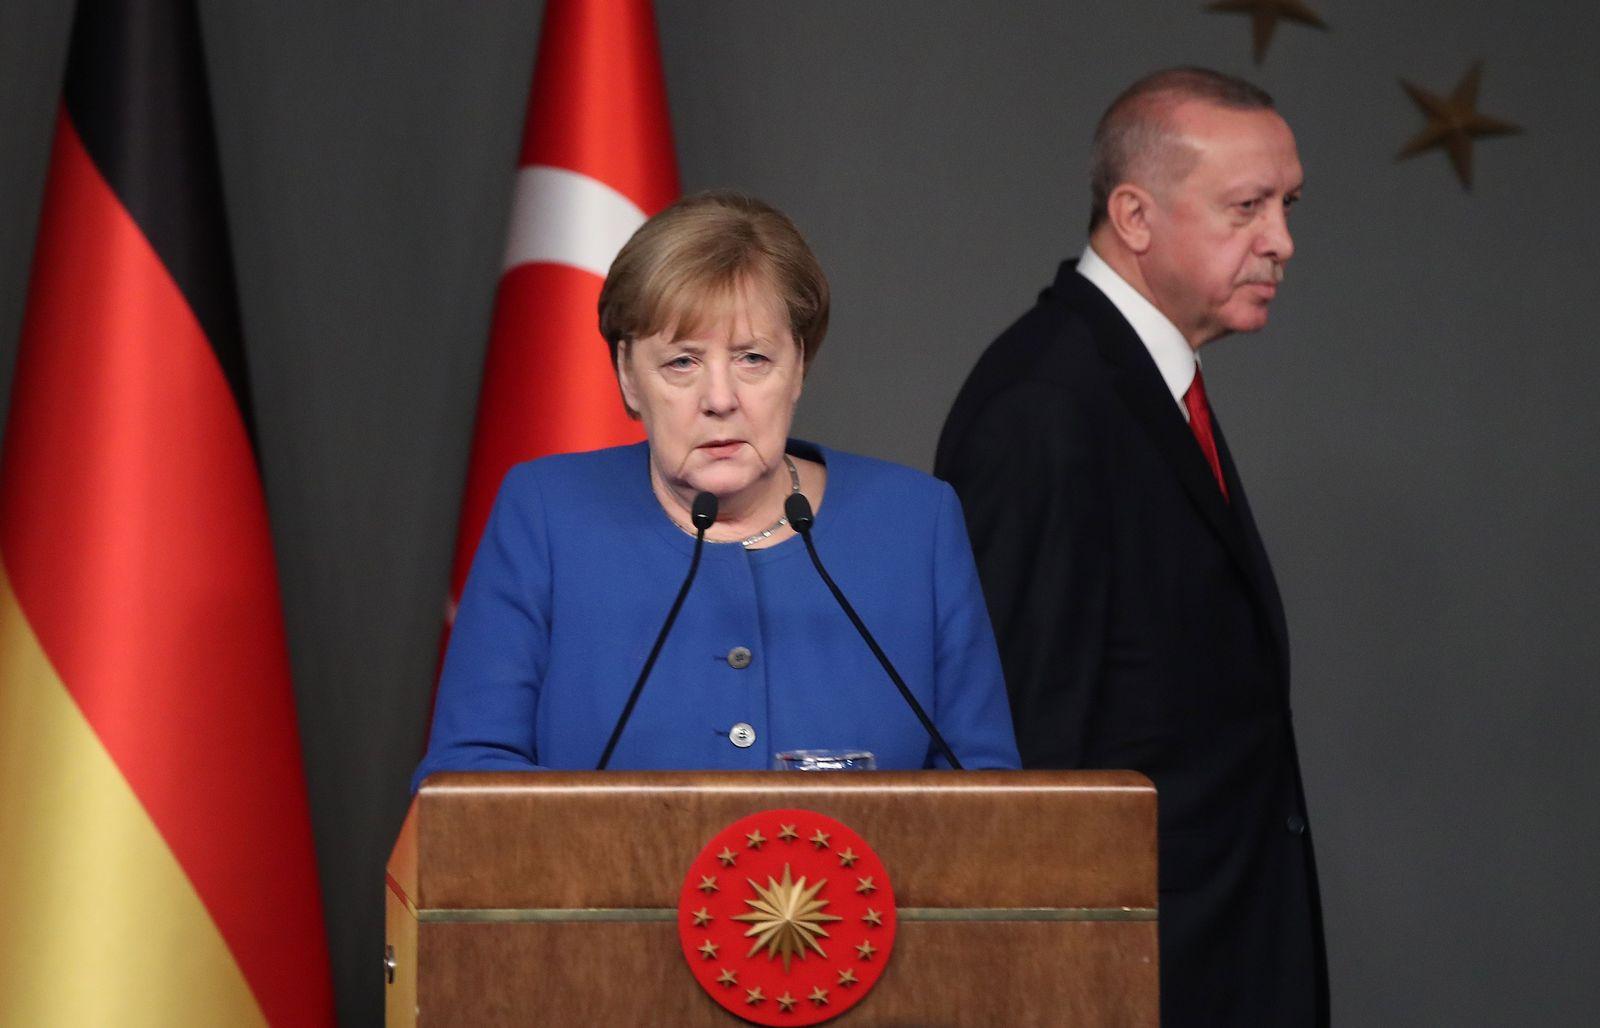 German Chancellor Angela Merkel visits Turkey, Istanbul - 24 Jan 2020